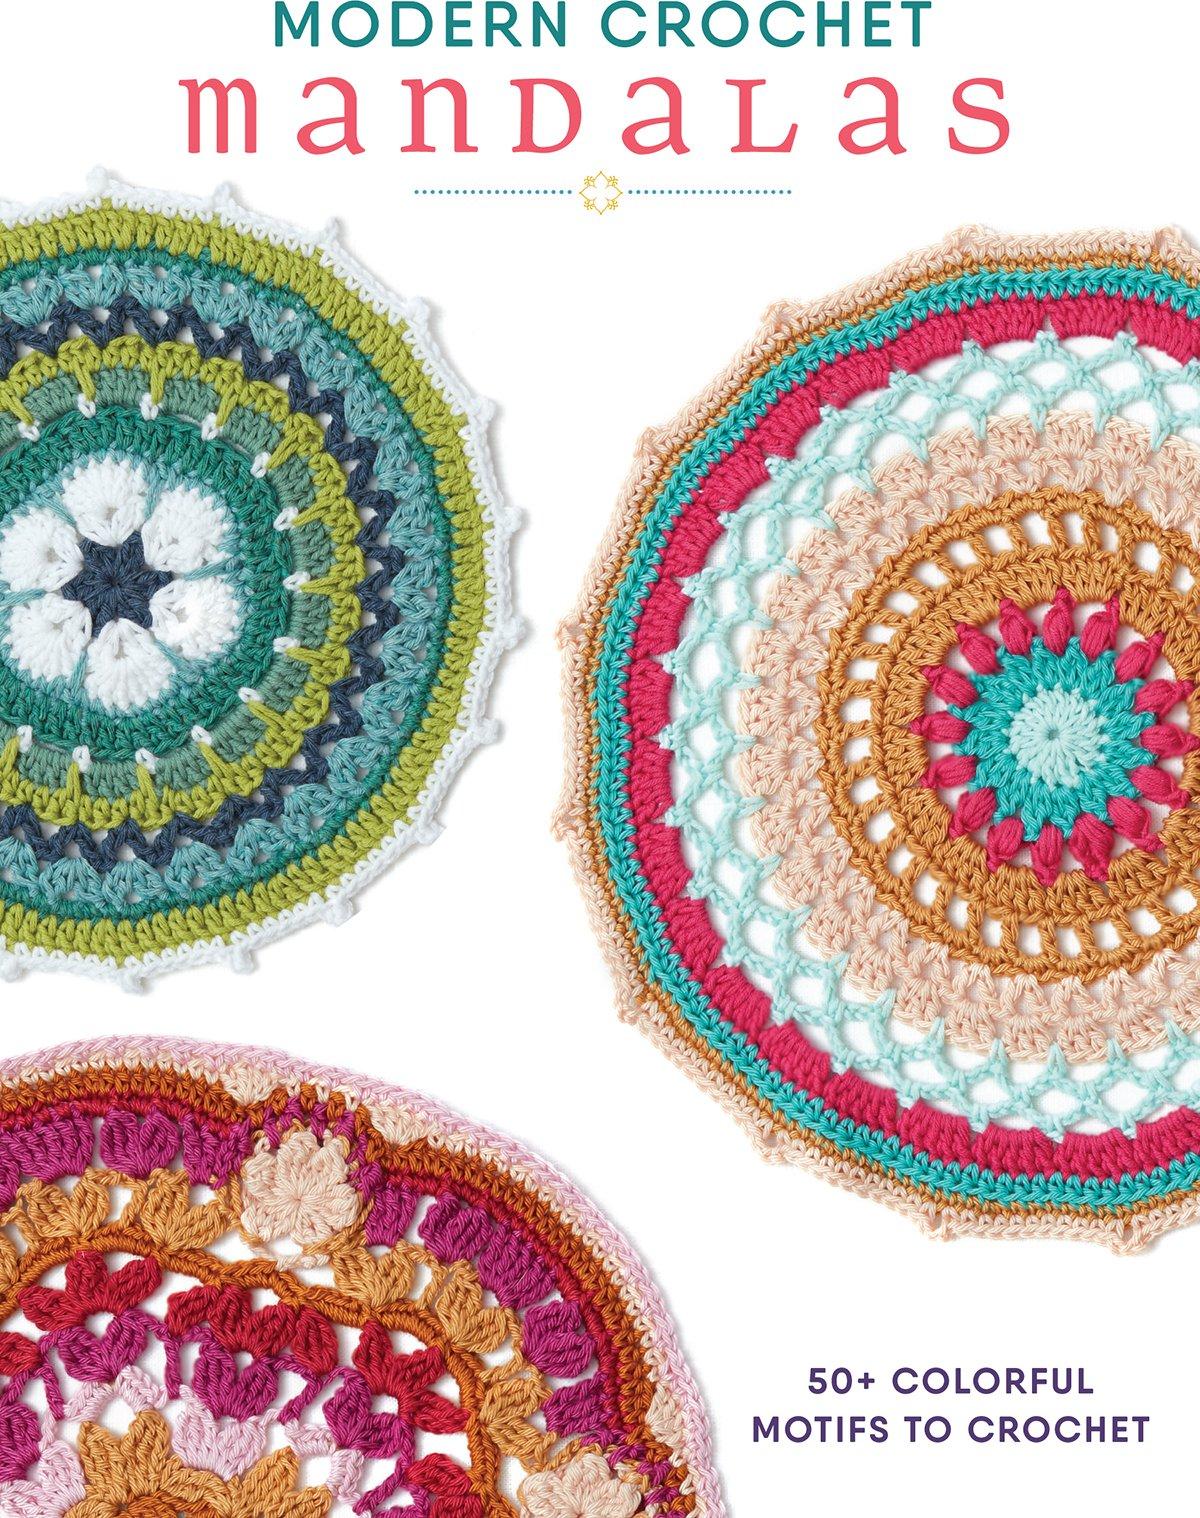 Modern Crochet Mandalas 50 Colorful Motifs To Crochet Interweave